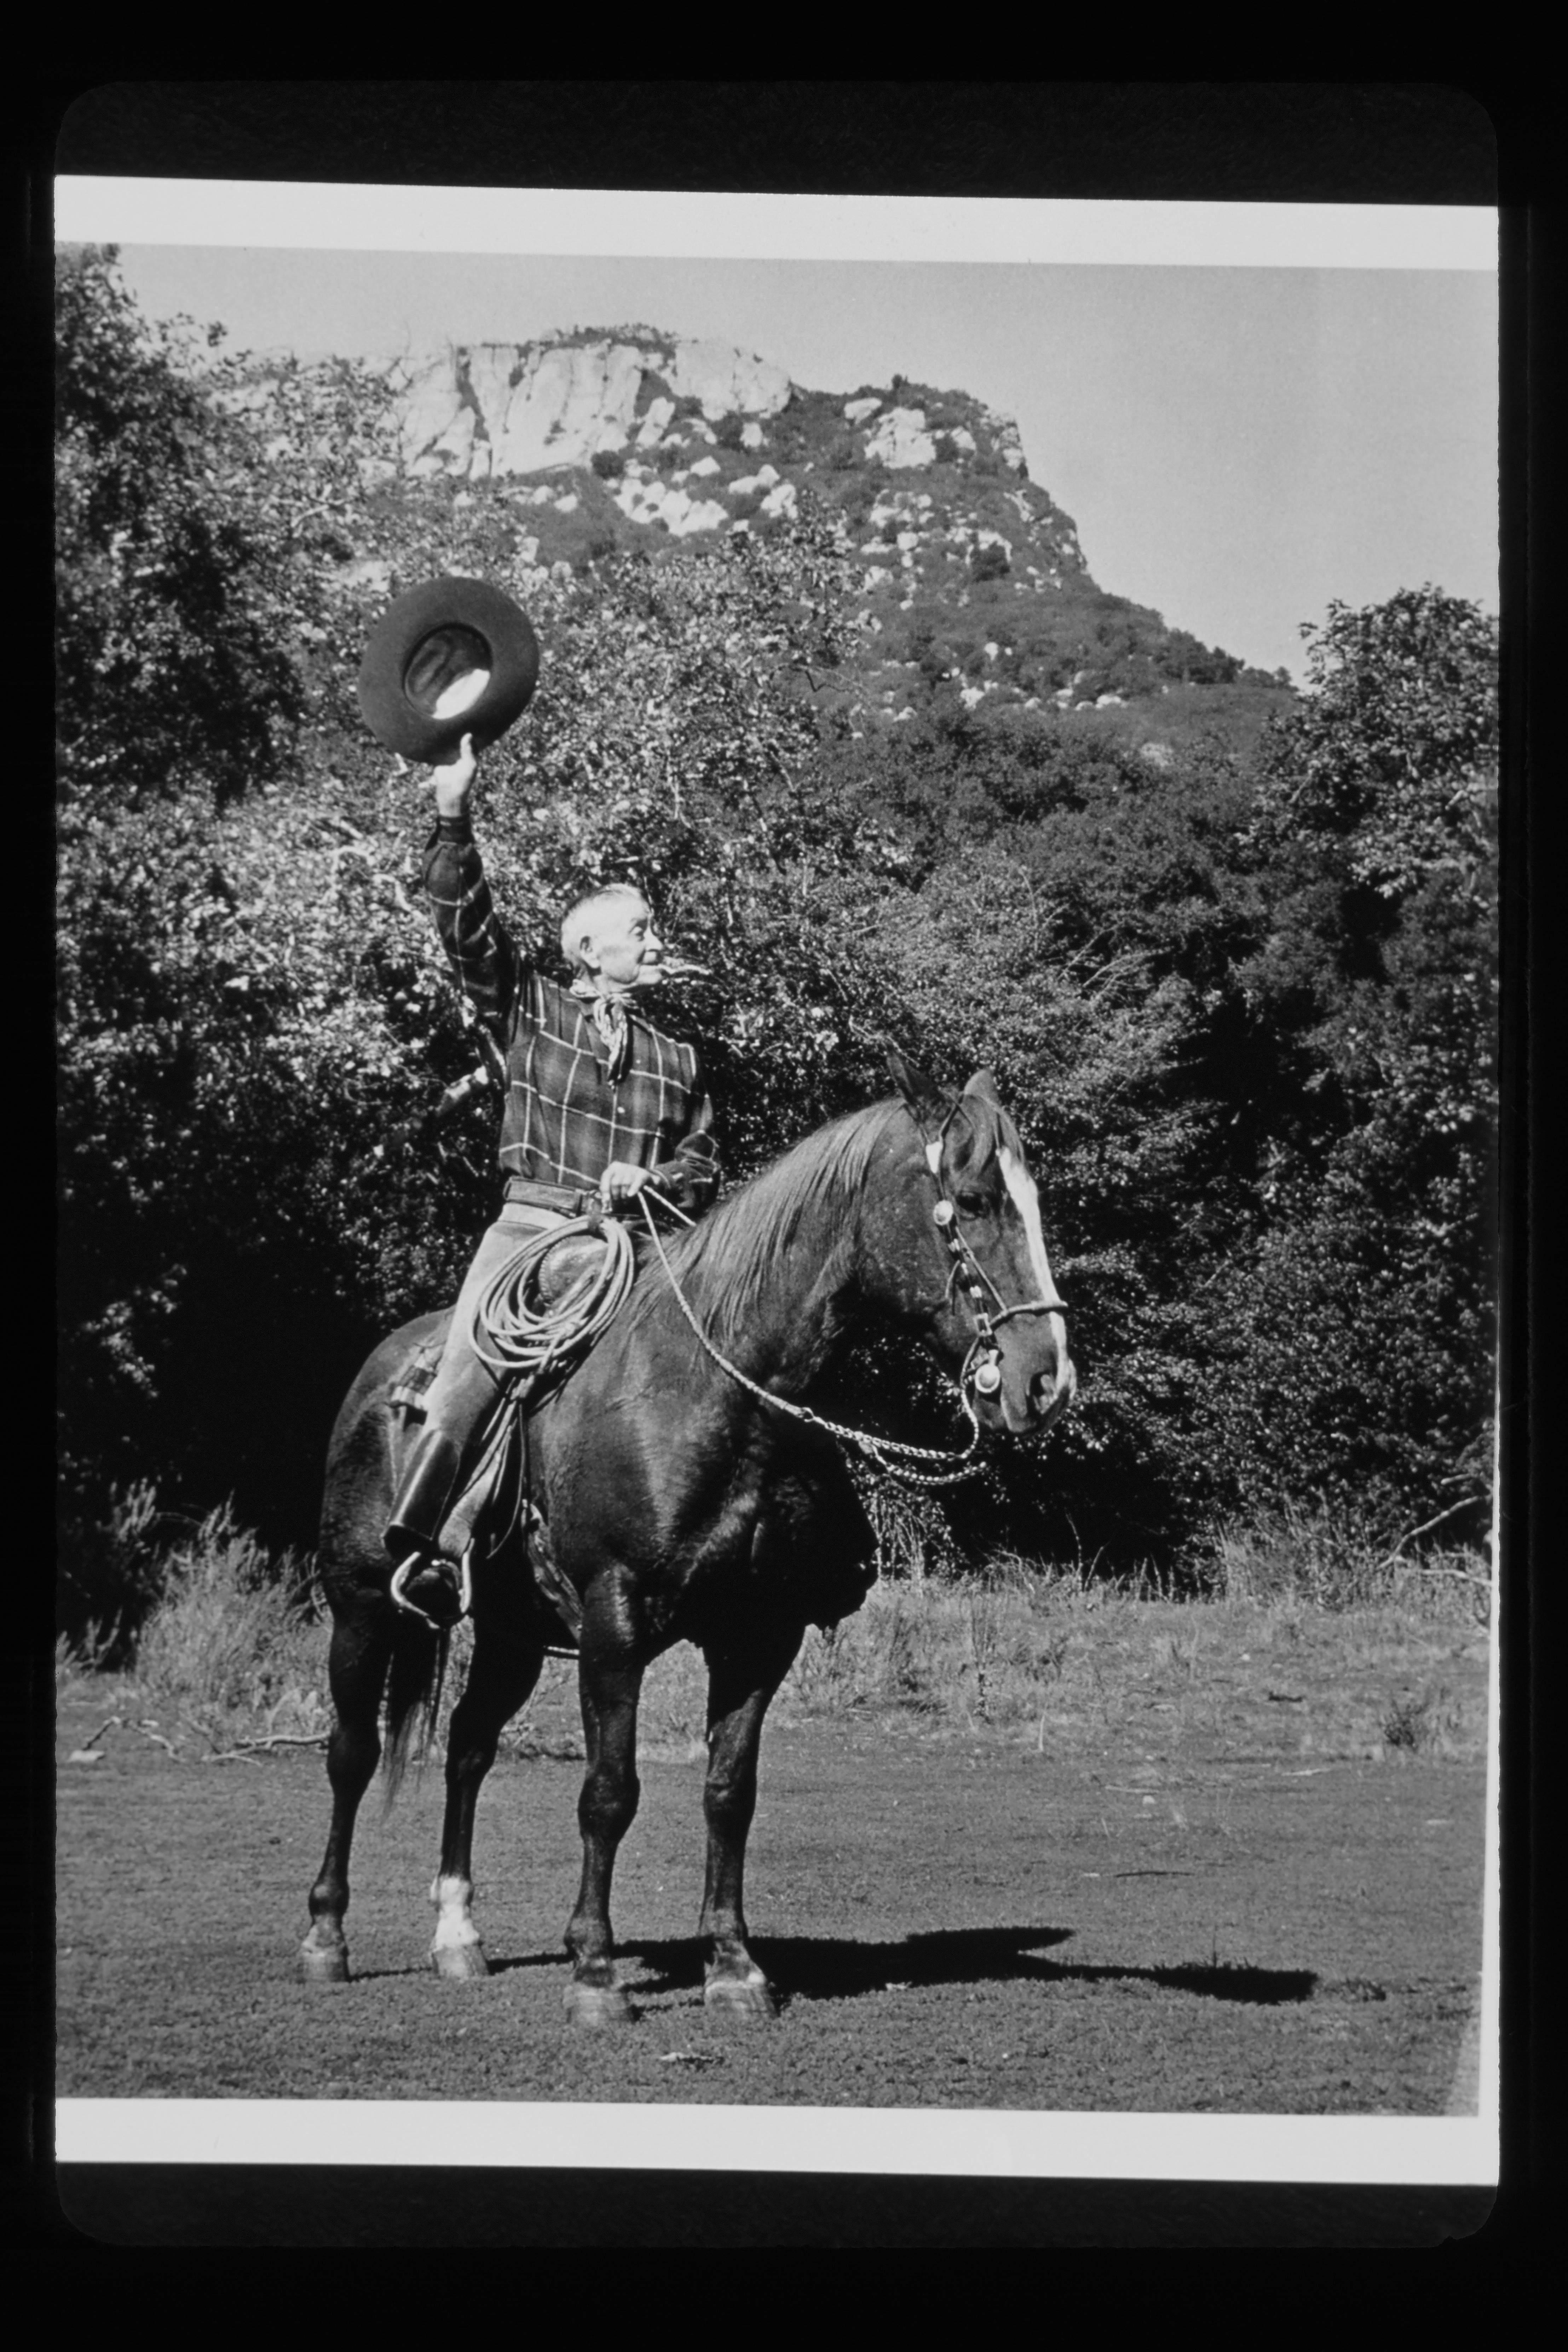 ortega on horse reduced